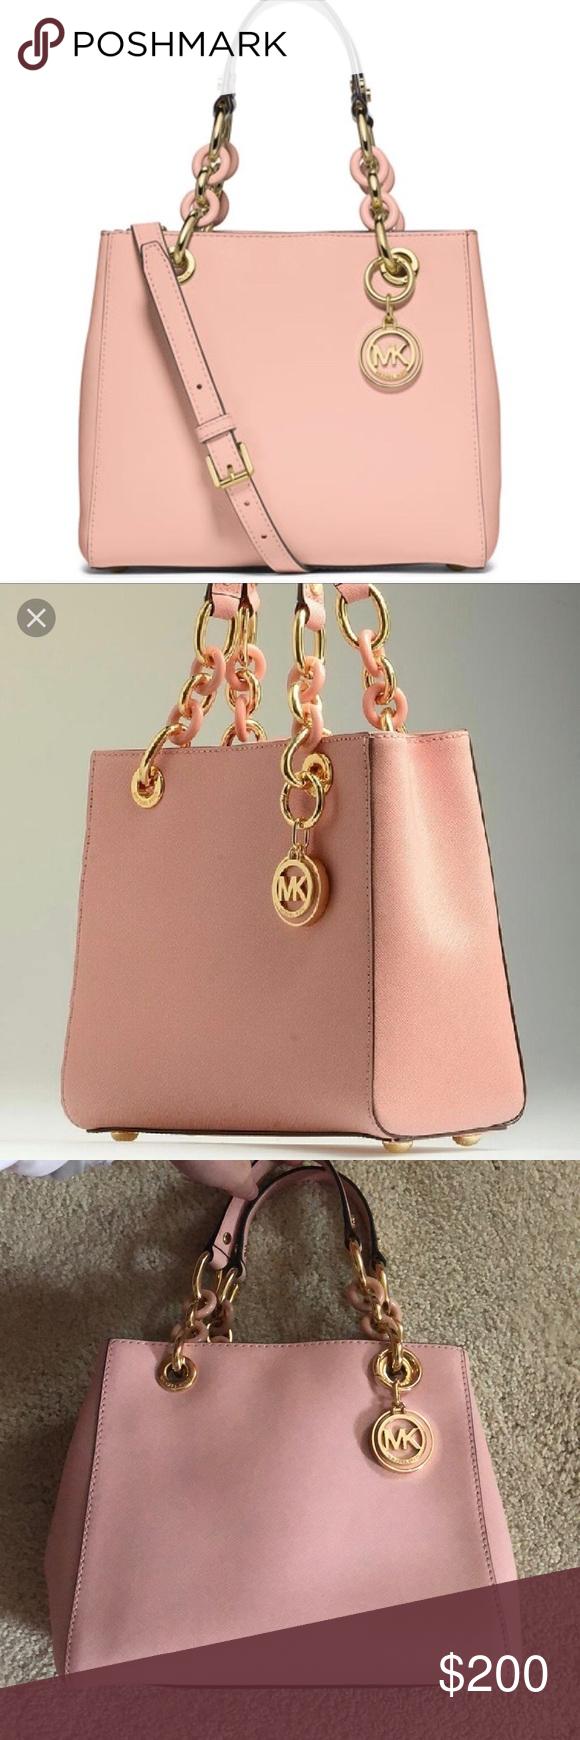 93ec59b95b3e Spotted while shopping on Poshmark  Michael Kors Cynthia Saffiano Satchel!   poshmark  fashion  shopping  style  Michael Kors  Handbags